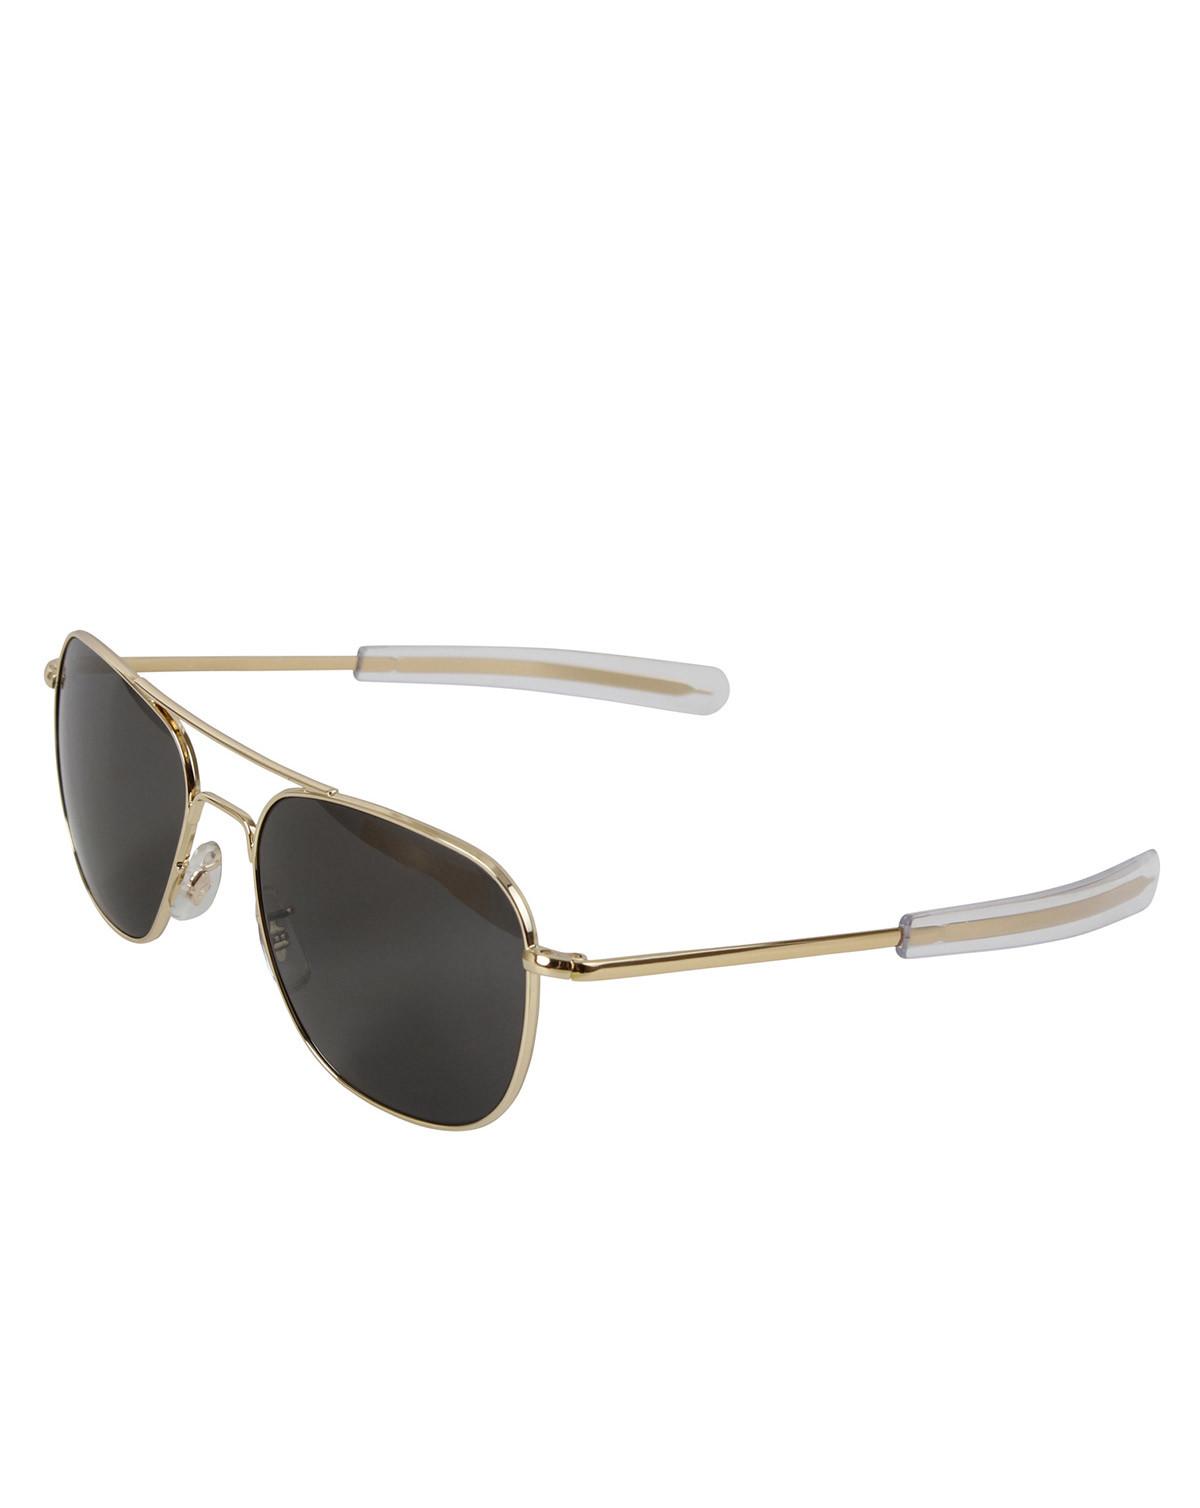 Image of   Rothco Pilots Solbriller American Optical Original (Guld m. Gråt Glas, One Size)